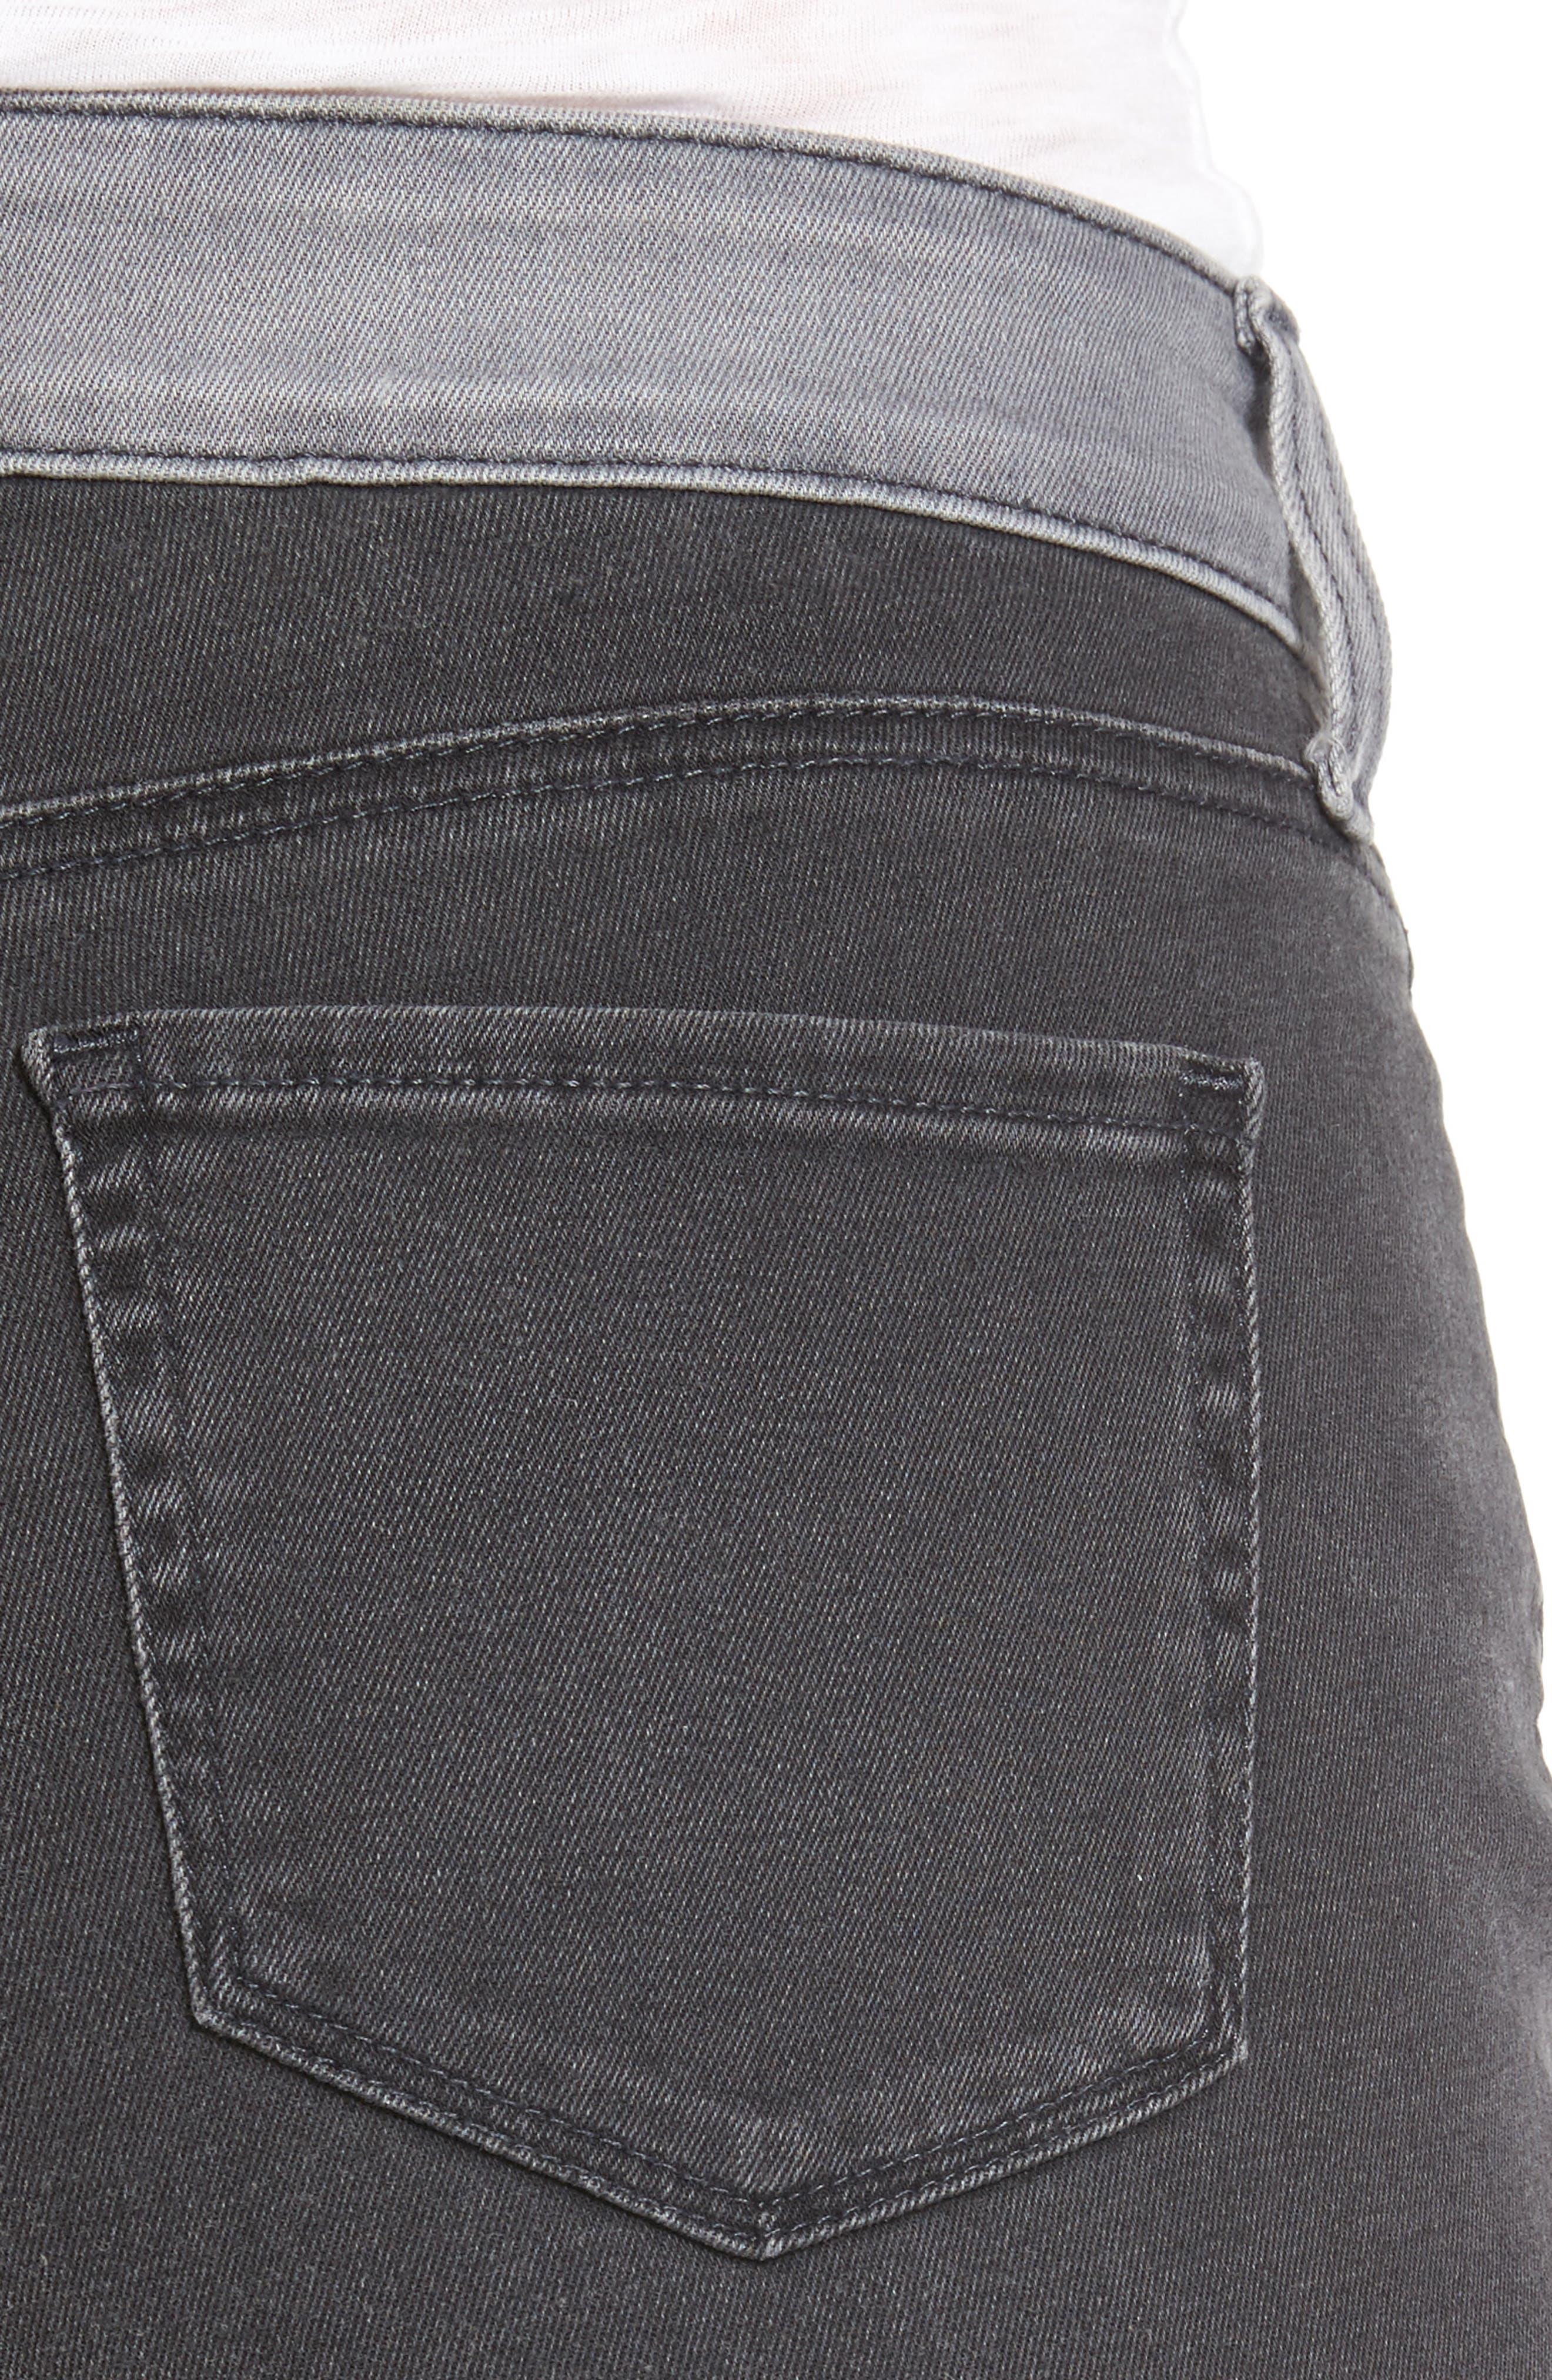 Two Tone Stretch Girlfriend Jeans,                             Alternate thumbnail 4, color,                             Cassiar